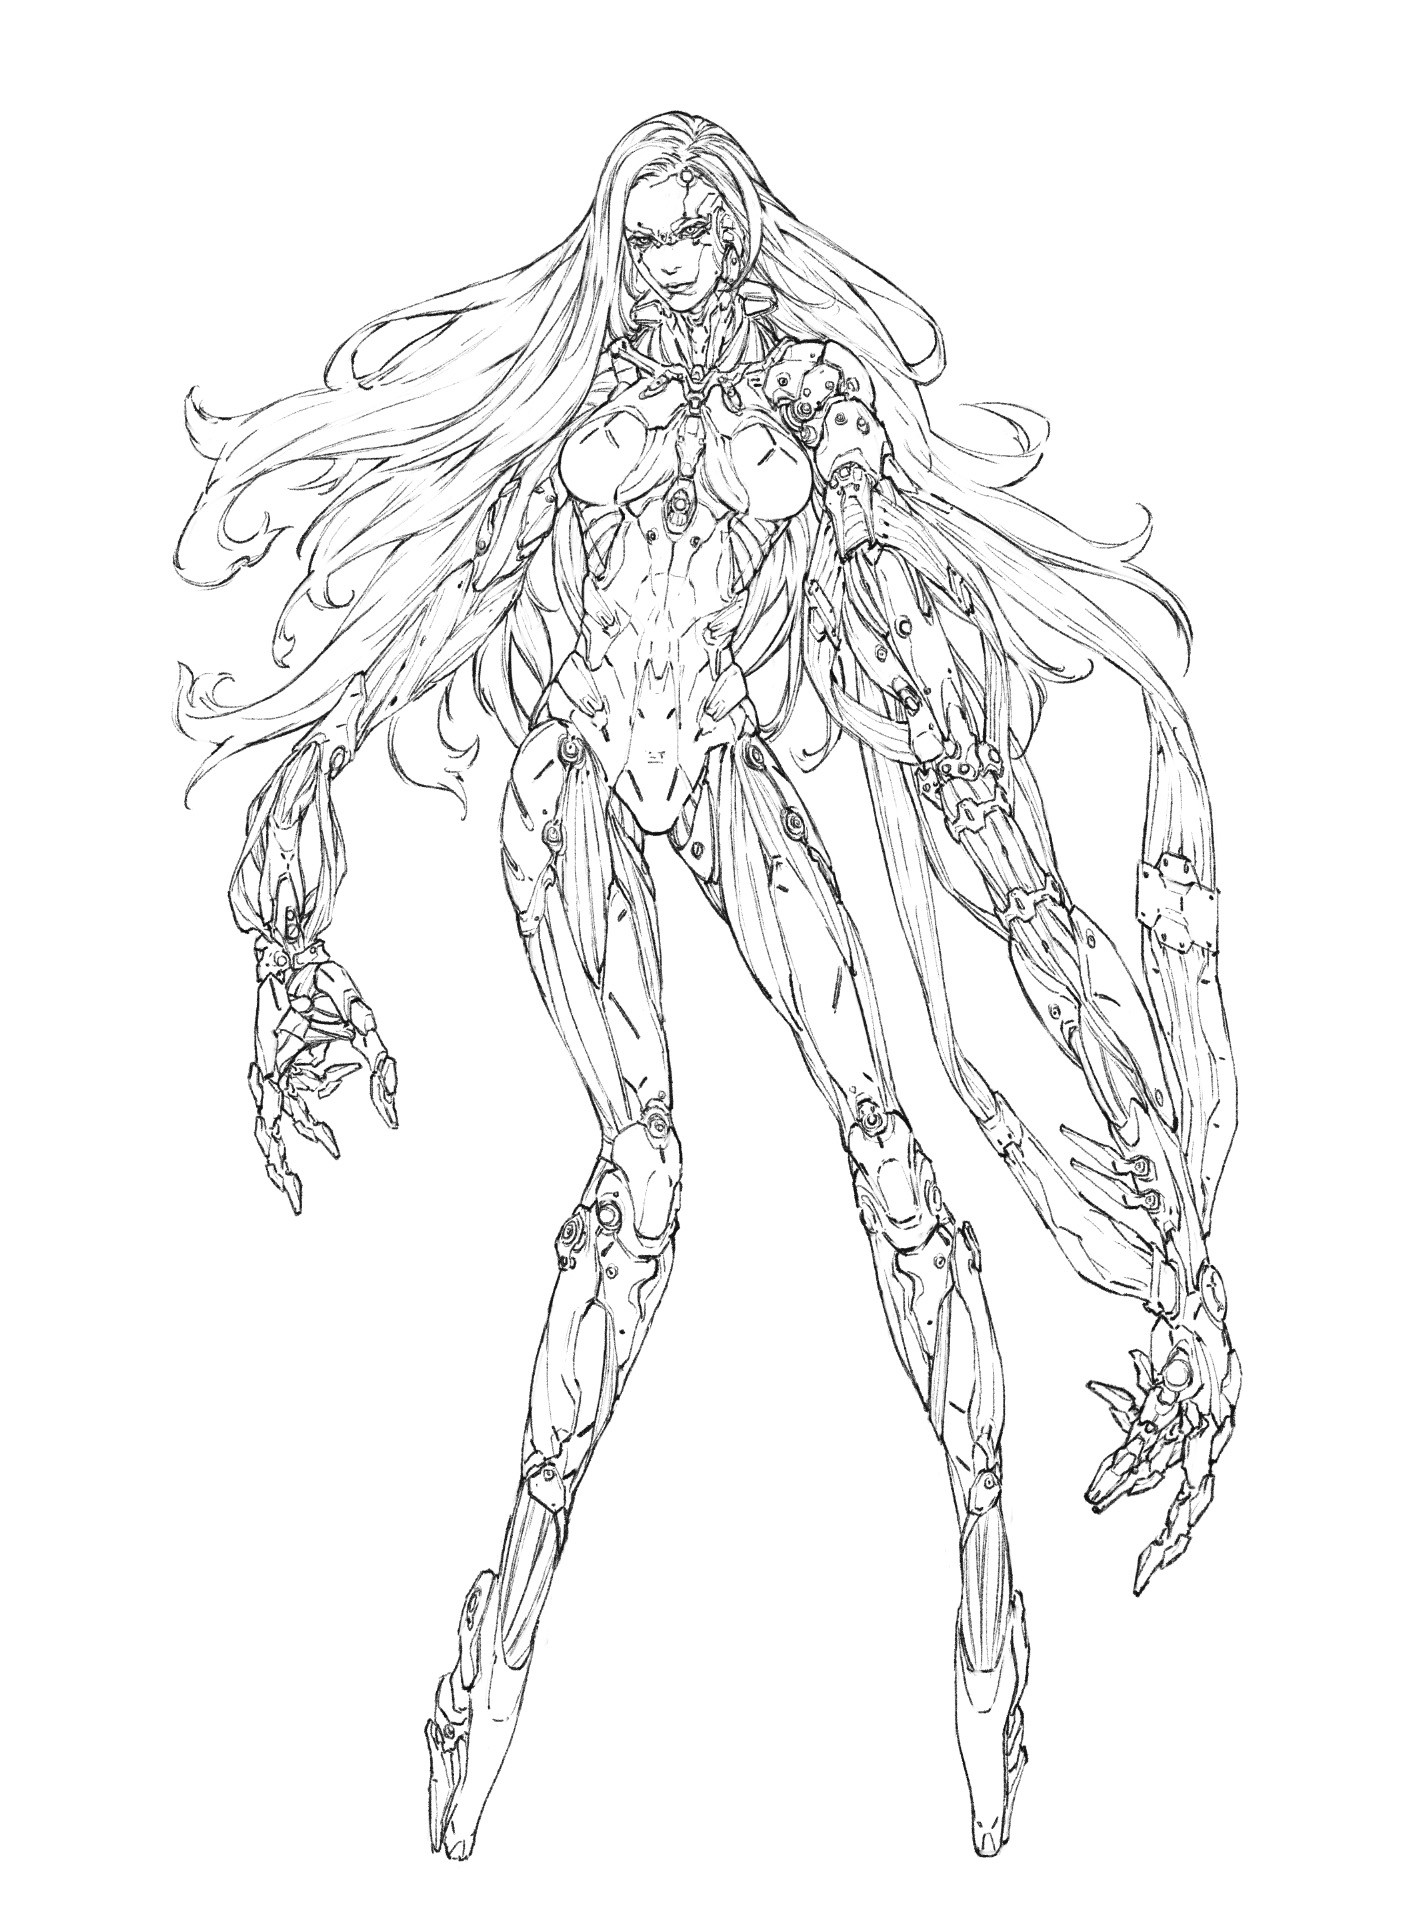 Woo kim cyborgirl creature 01 line